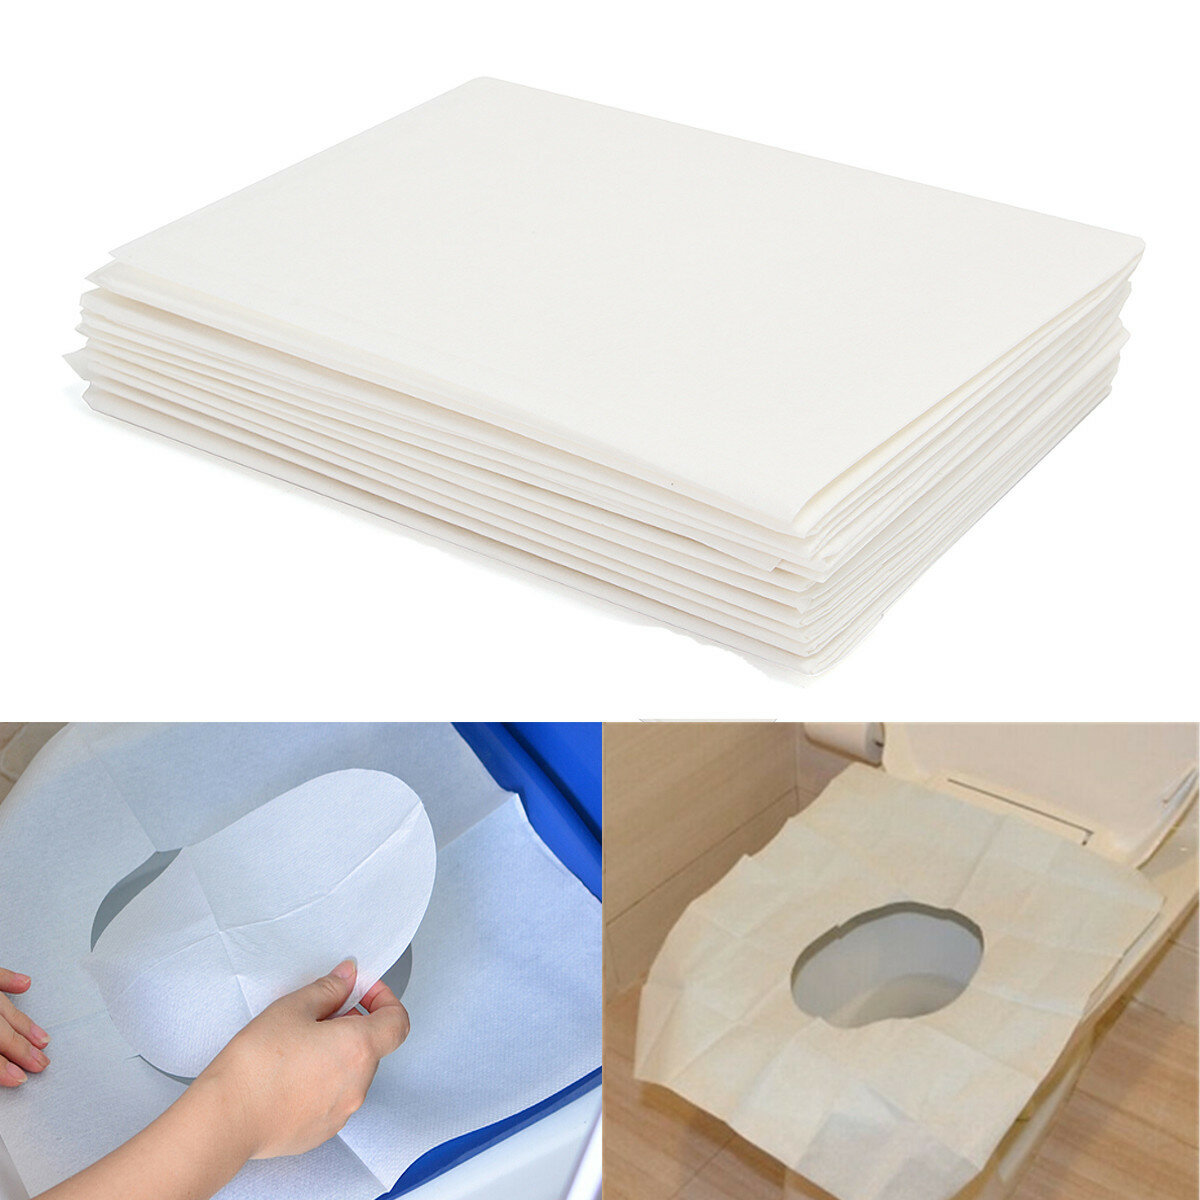 Brilliant 10Pcs Toilet Seat Covers Paper Travel Biodegradable Disposable Sanitary Ibusinesslaw Wood Chair Design Ideas Ibusinesslaworg